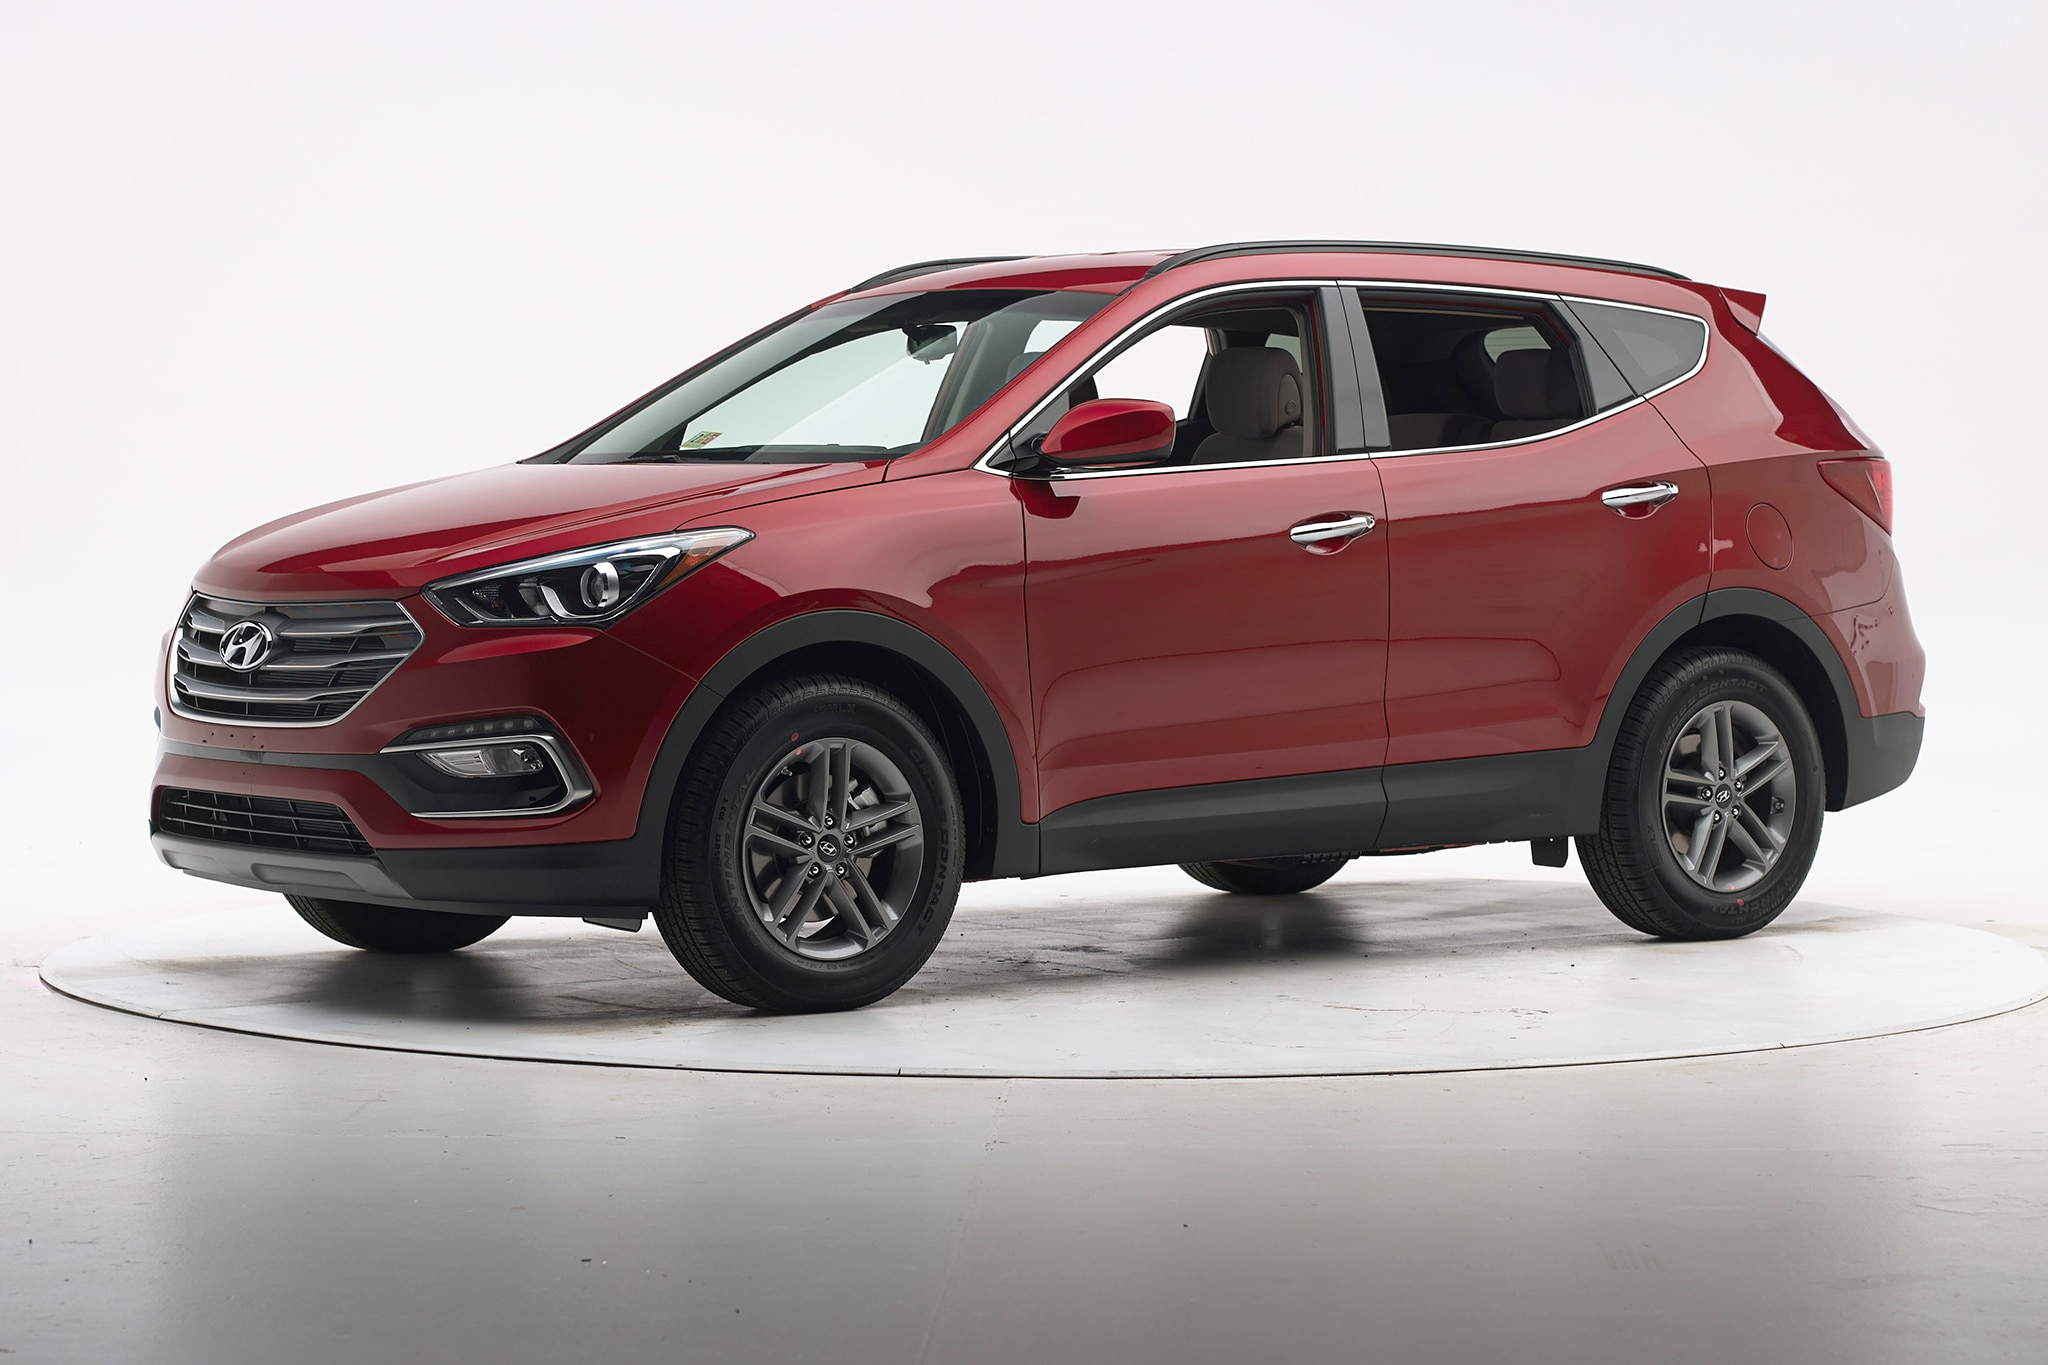 2016 Hyundai Santa Fe >> 2017 Hyundai Santa Fe Sport IIHS testing